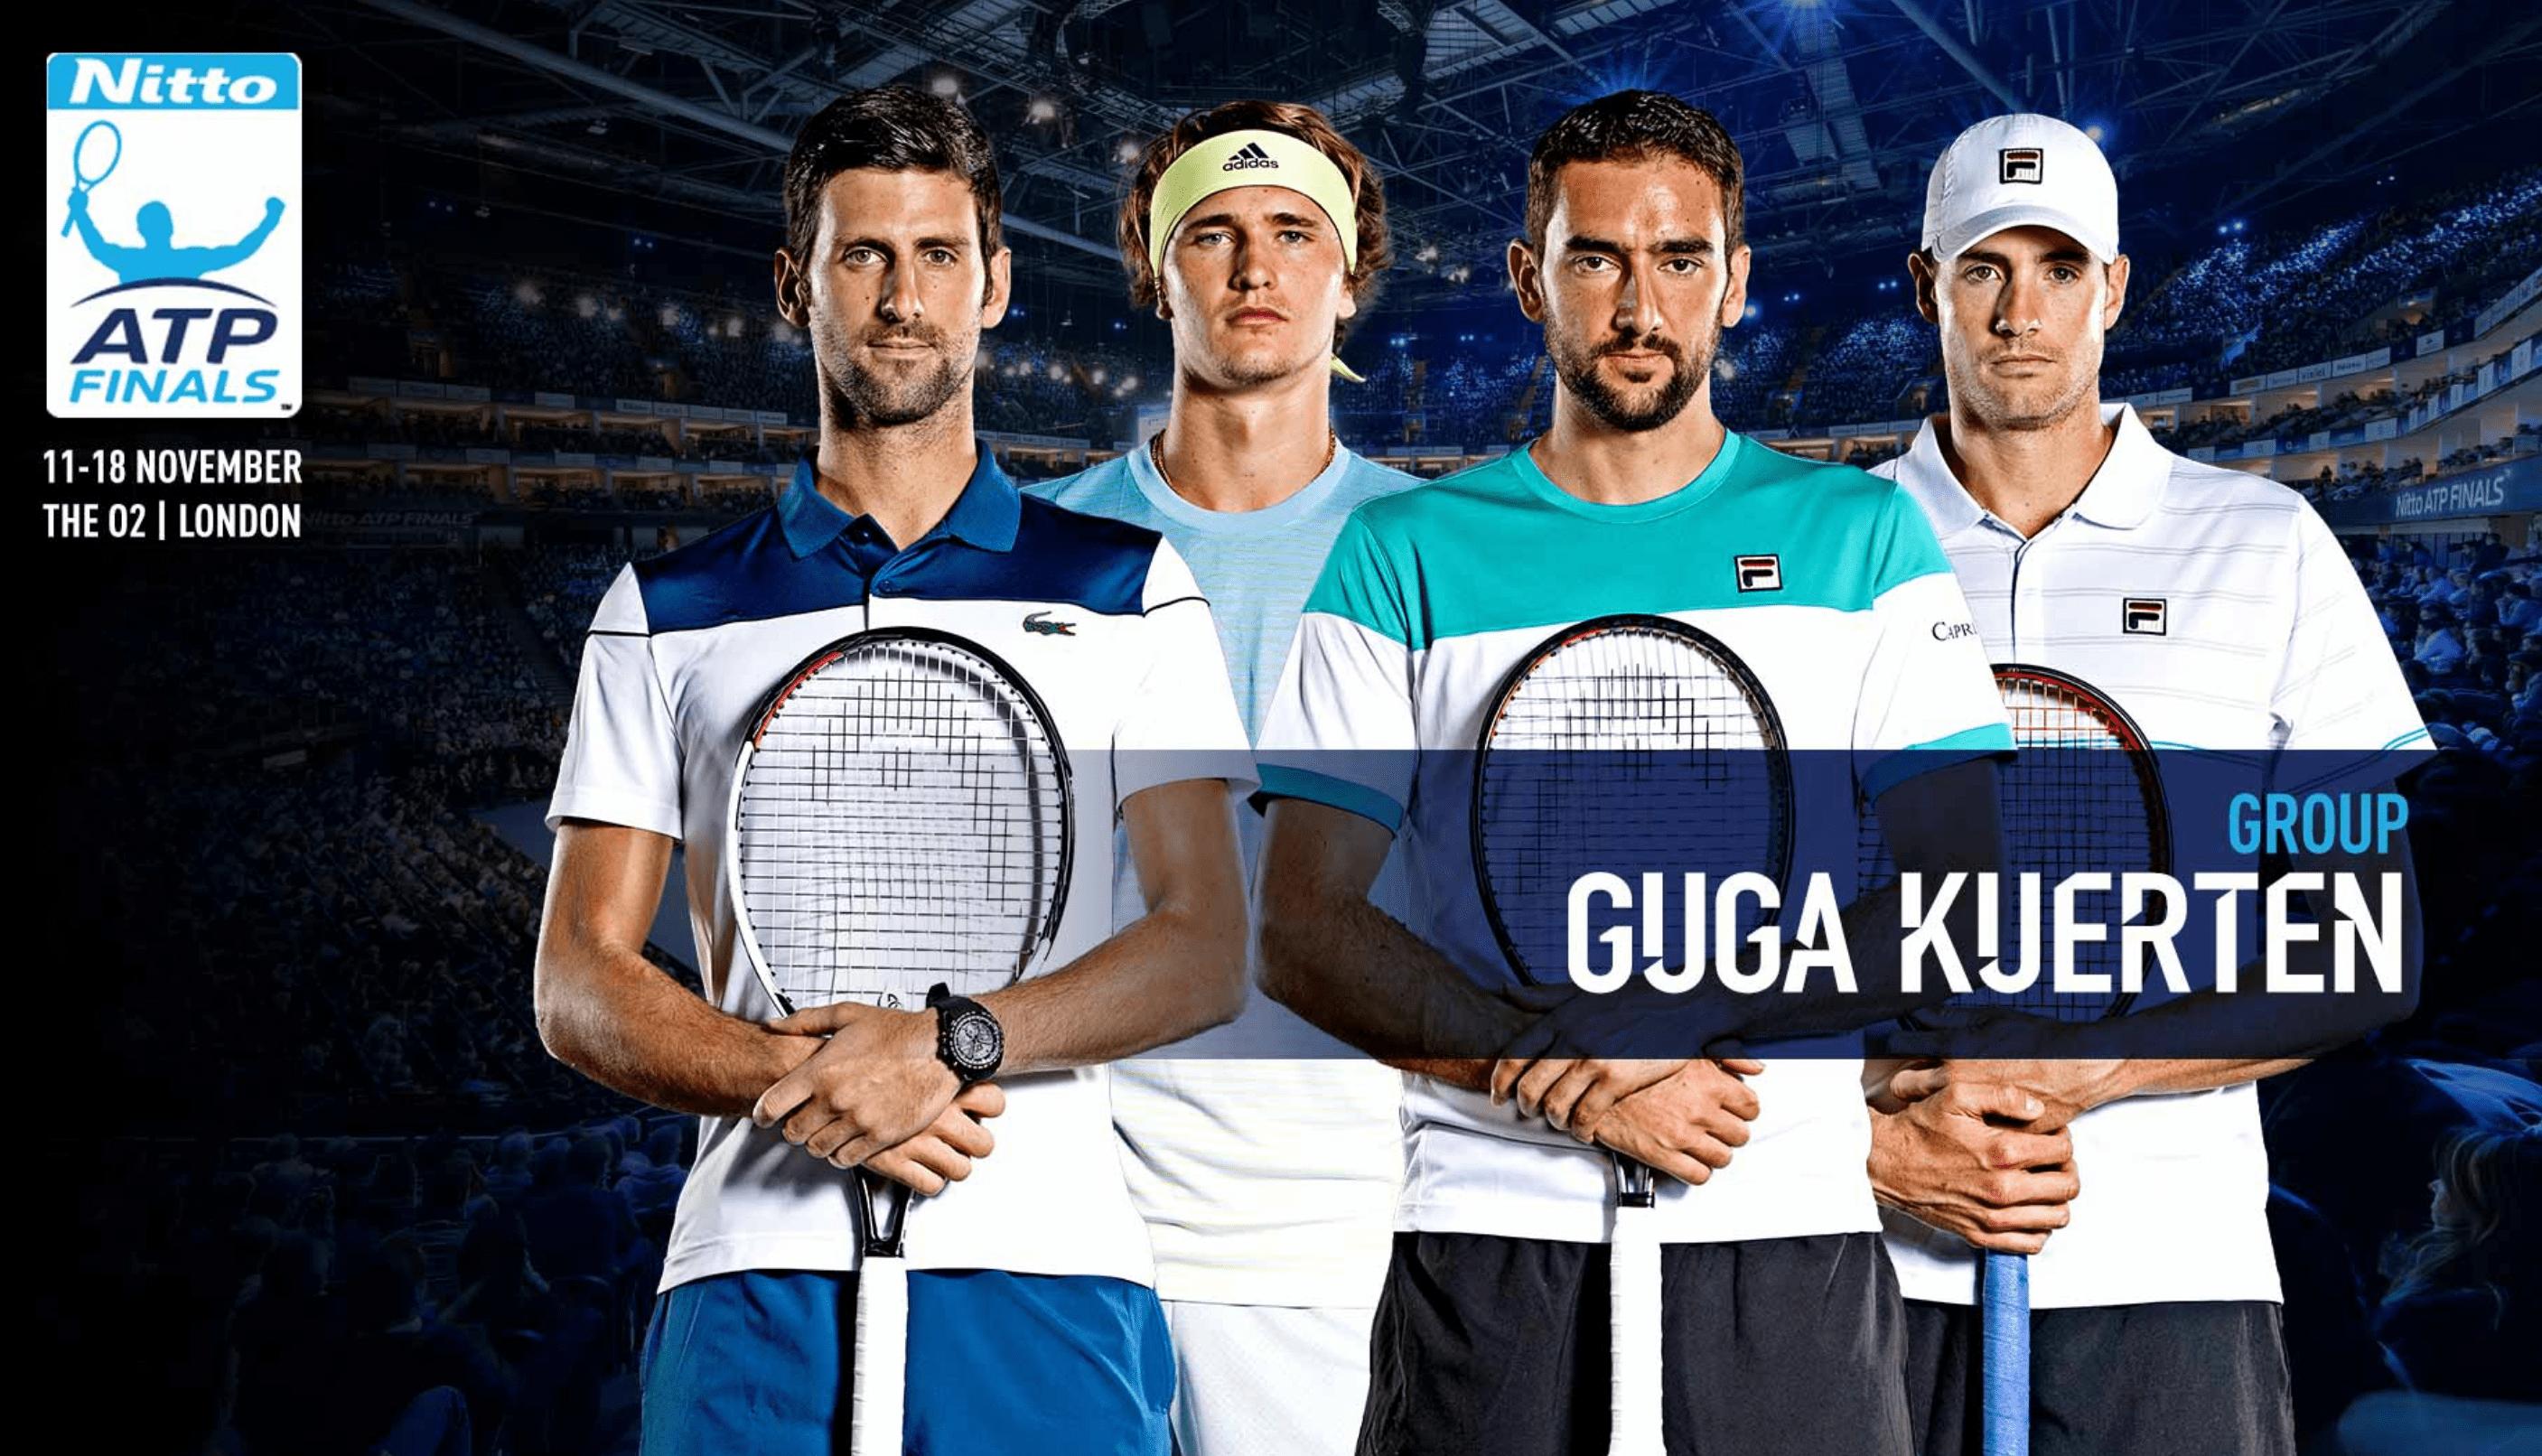 Gruppo-Guga-Kuerten-ATP-Finals-2018